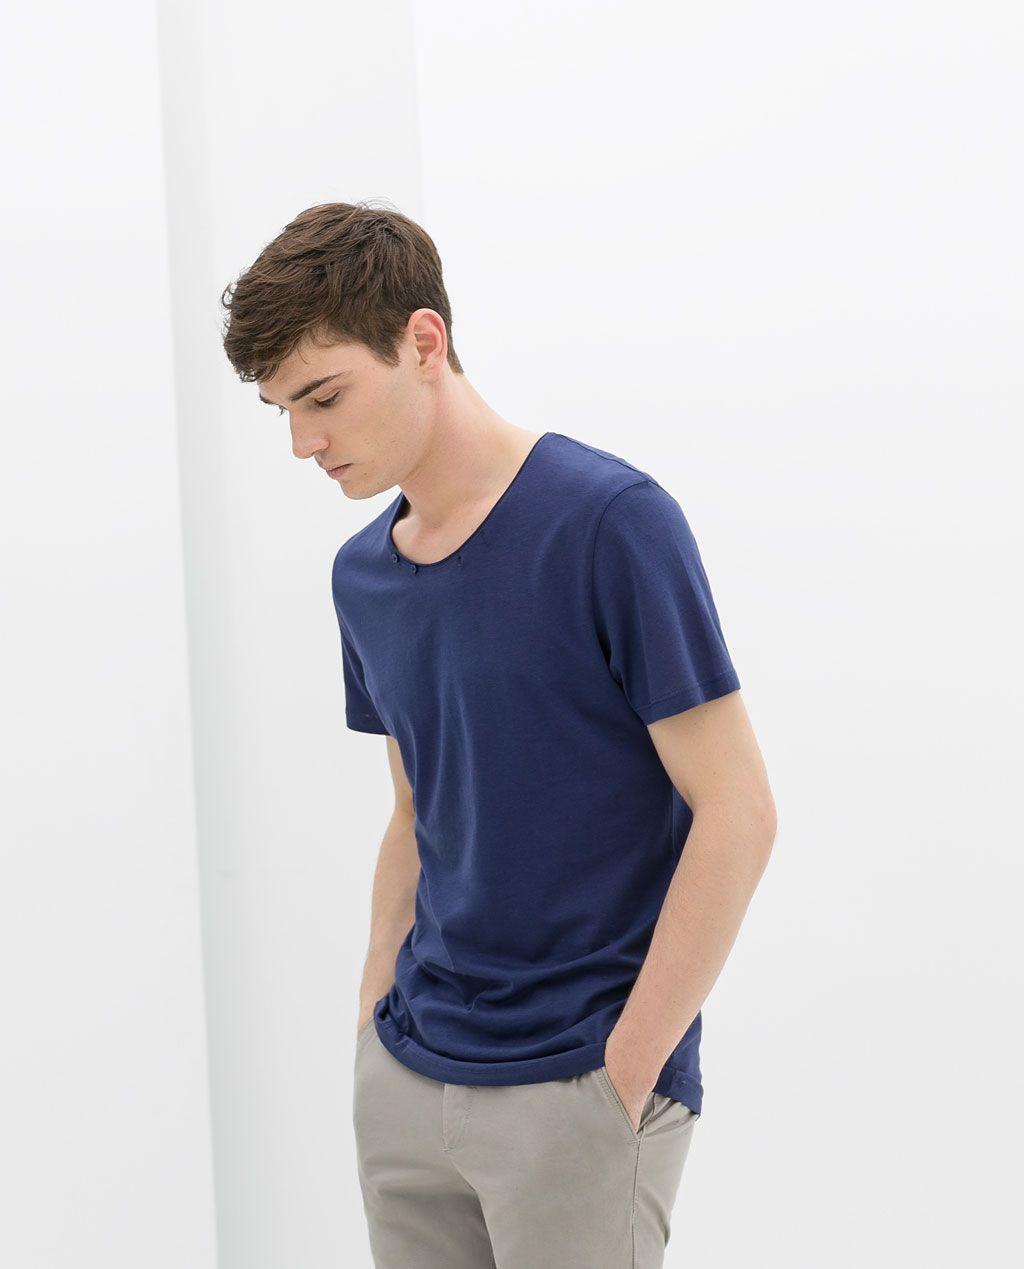 870a01e1 ZARA - MAN - T-SHIRT WITH BUTTONS #MensT-shirts | Mens T-shirts ...